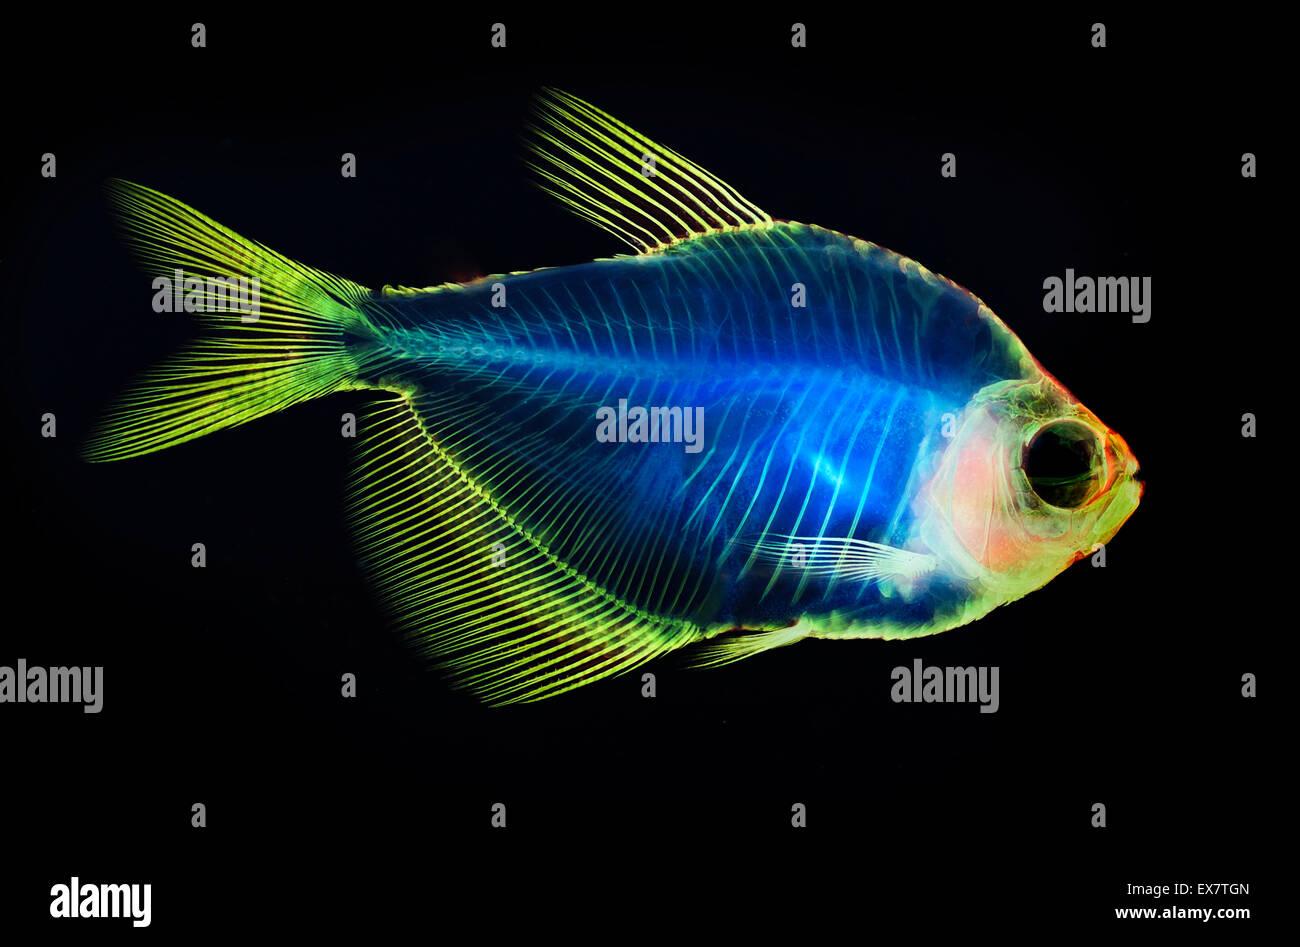 Fisch Skelett Anatomie Stockfoto, Bild: 84995477 - Alamy